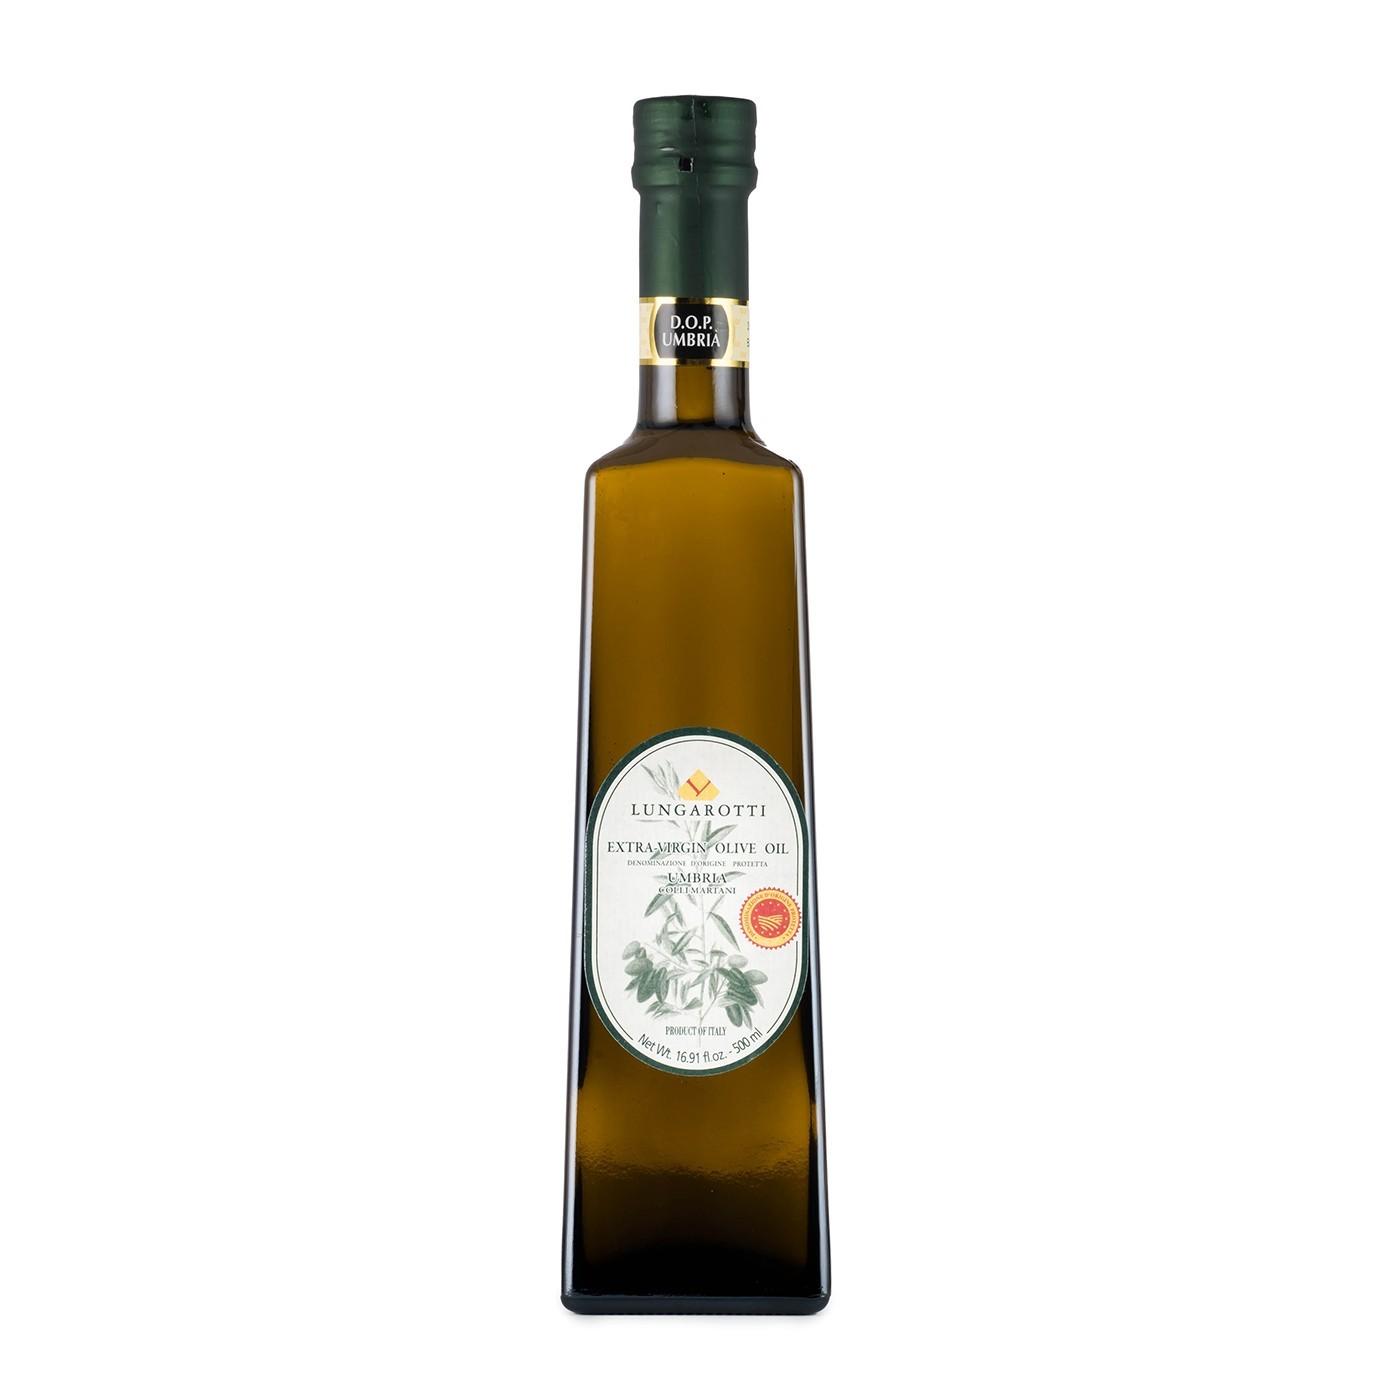 Umbria collimartani olive oil